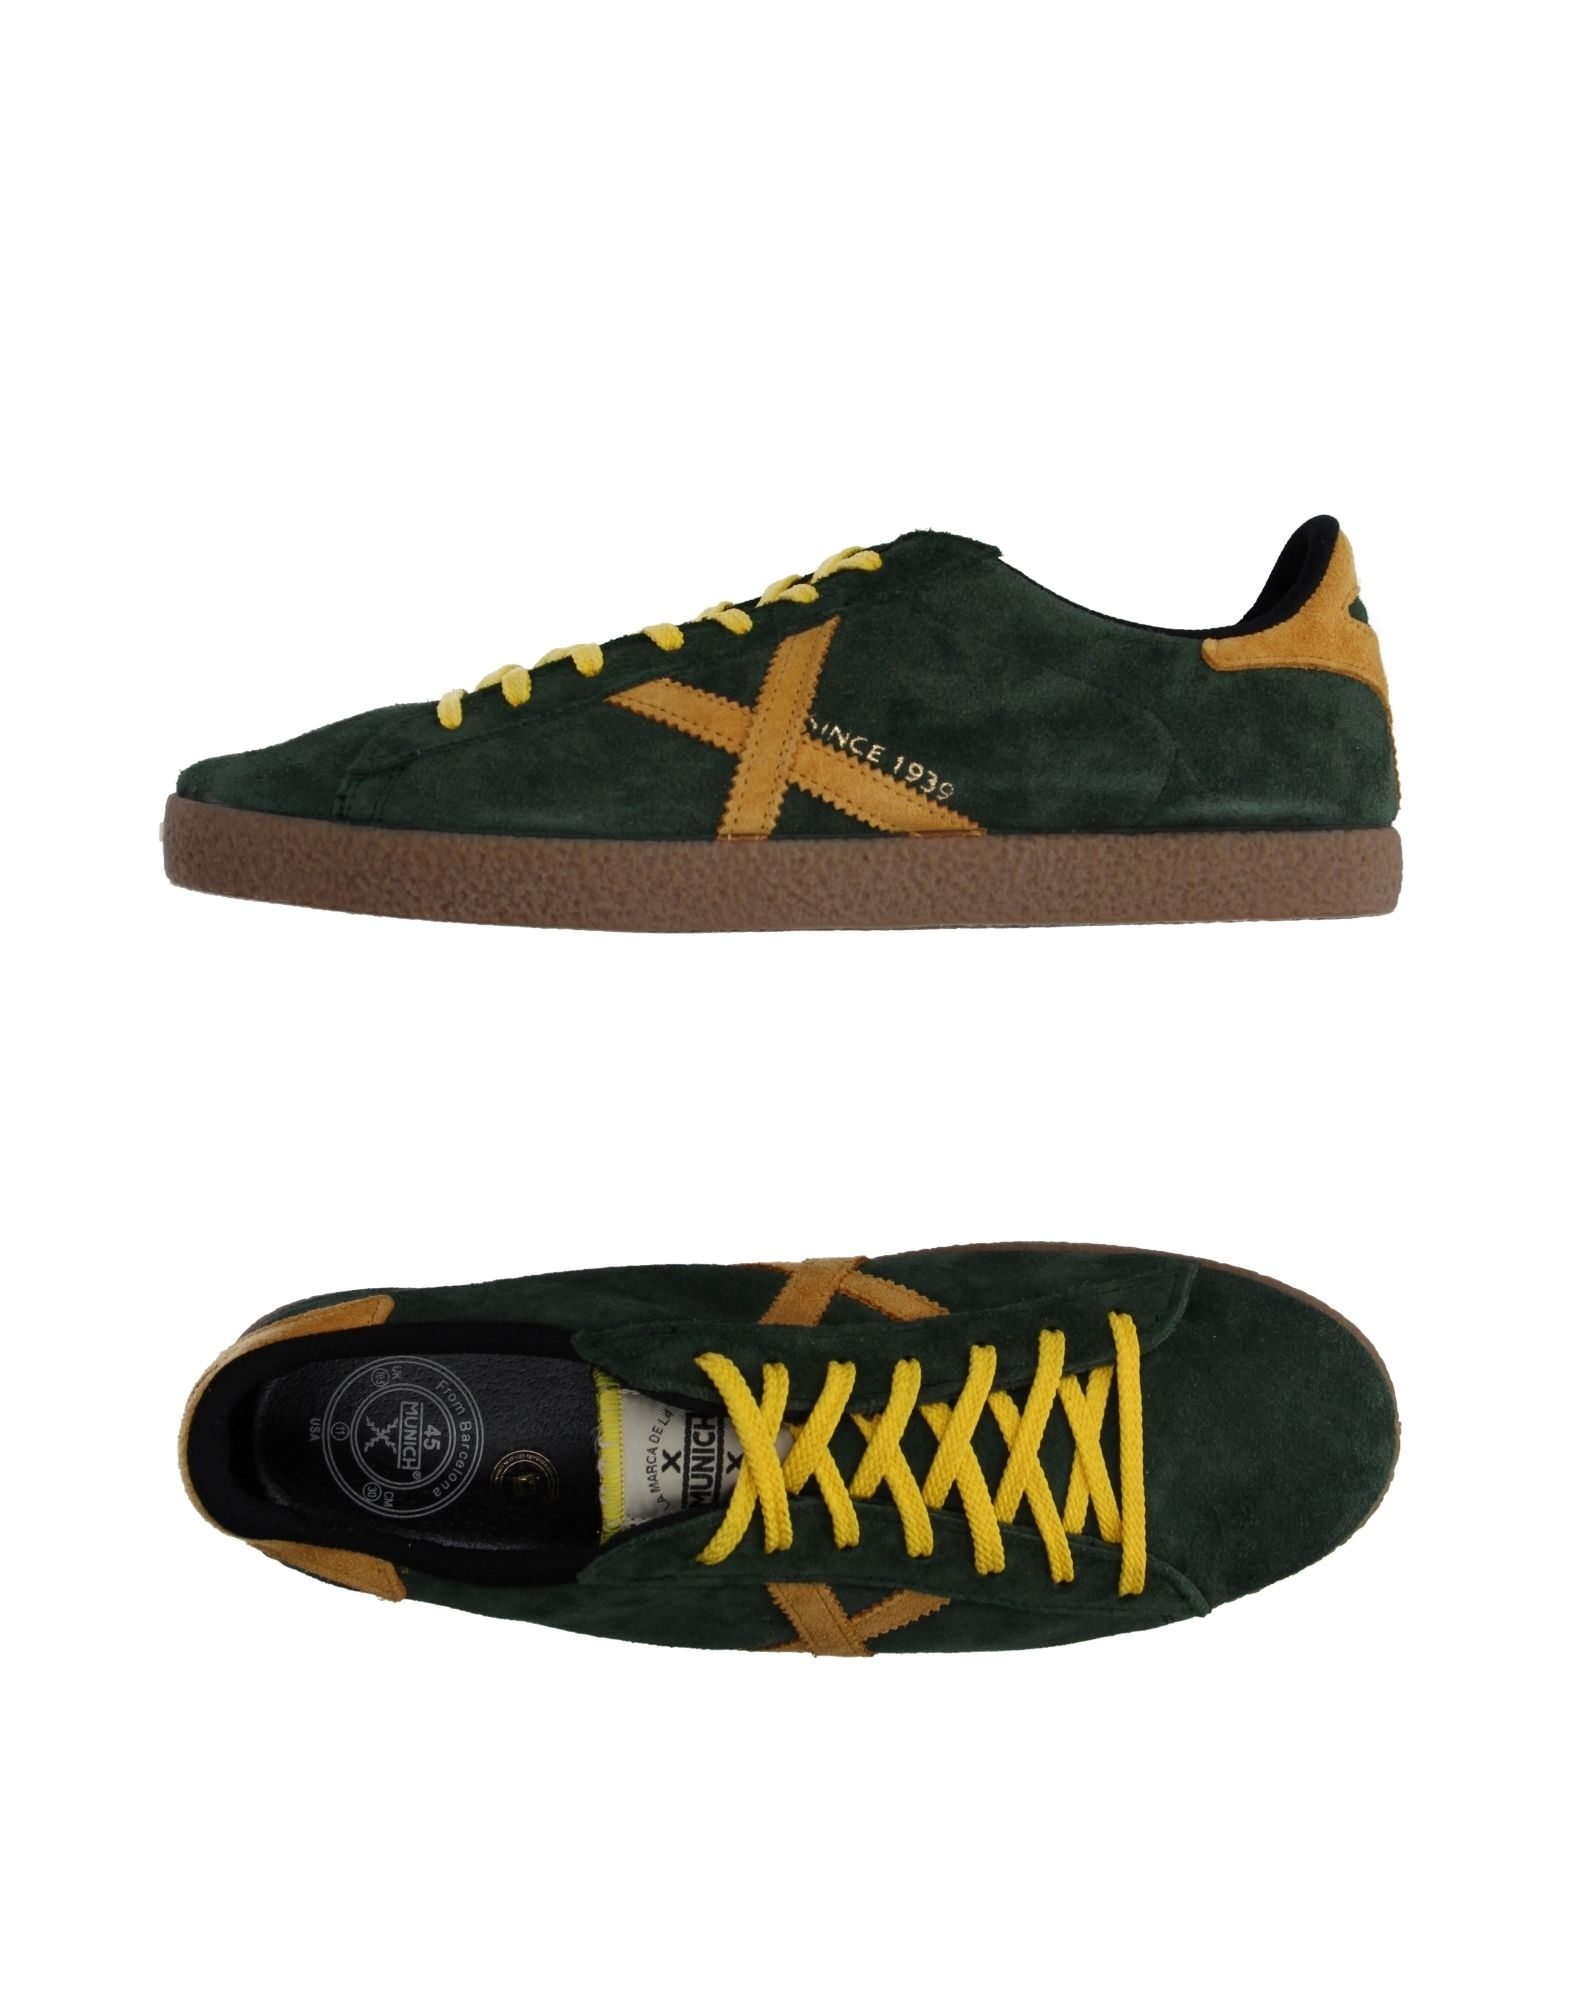 Rabatt echte Schuhe Munich Sneakers Herren  11057238GN